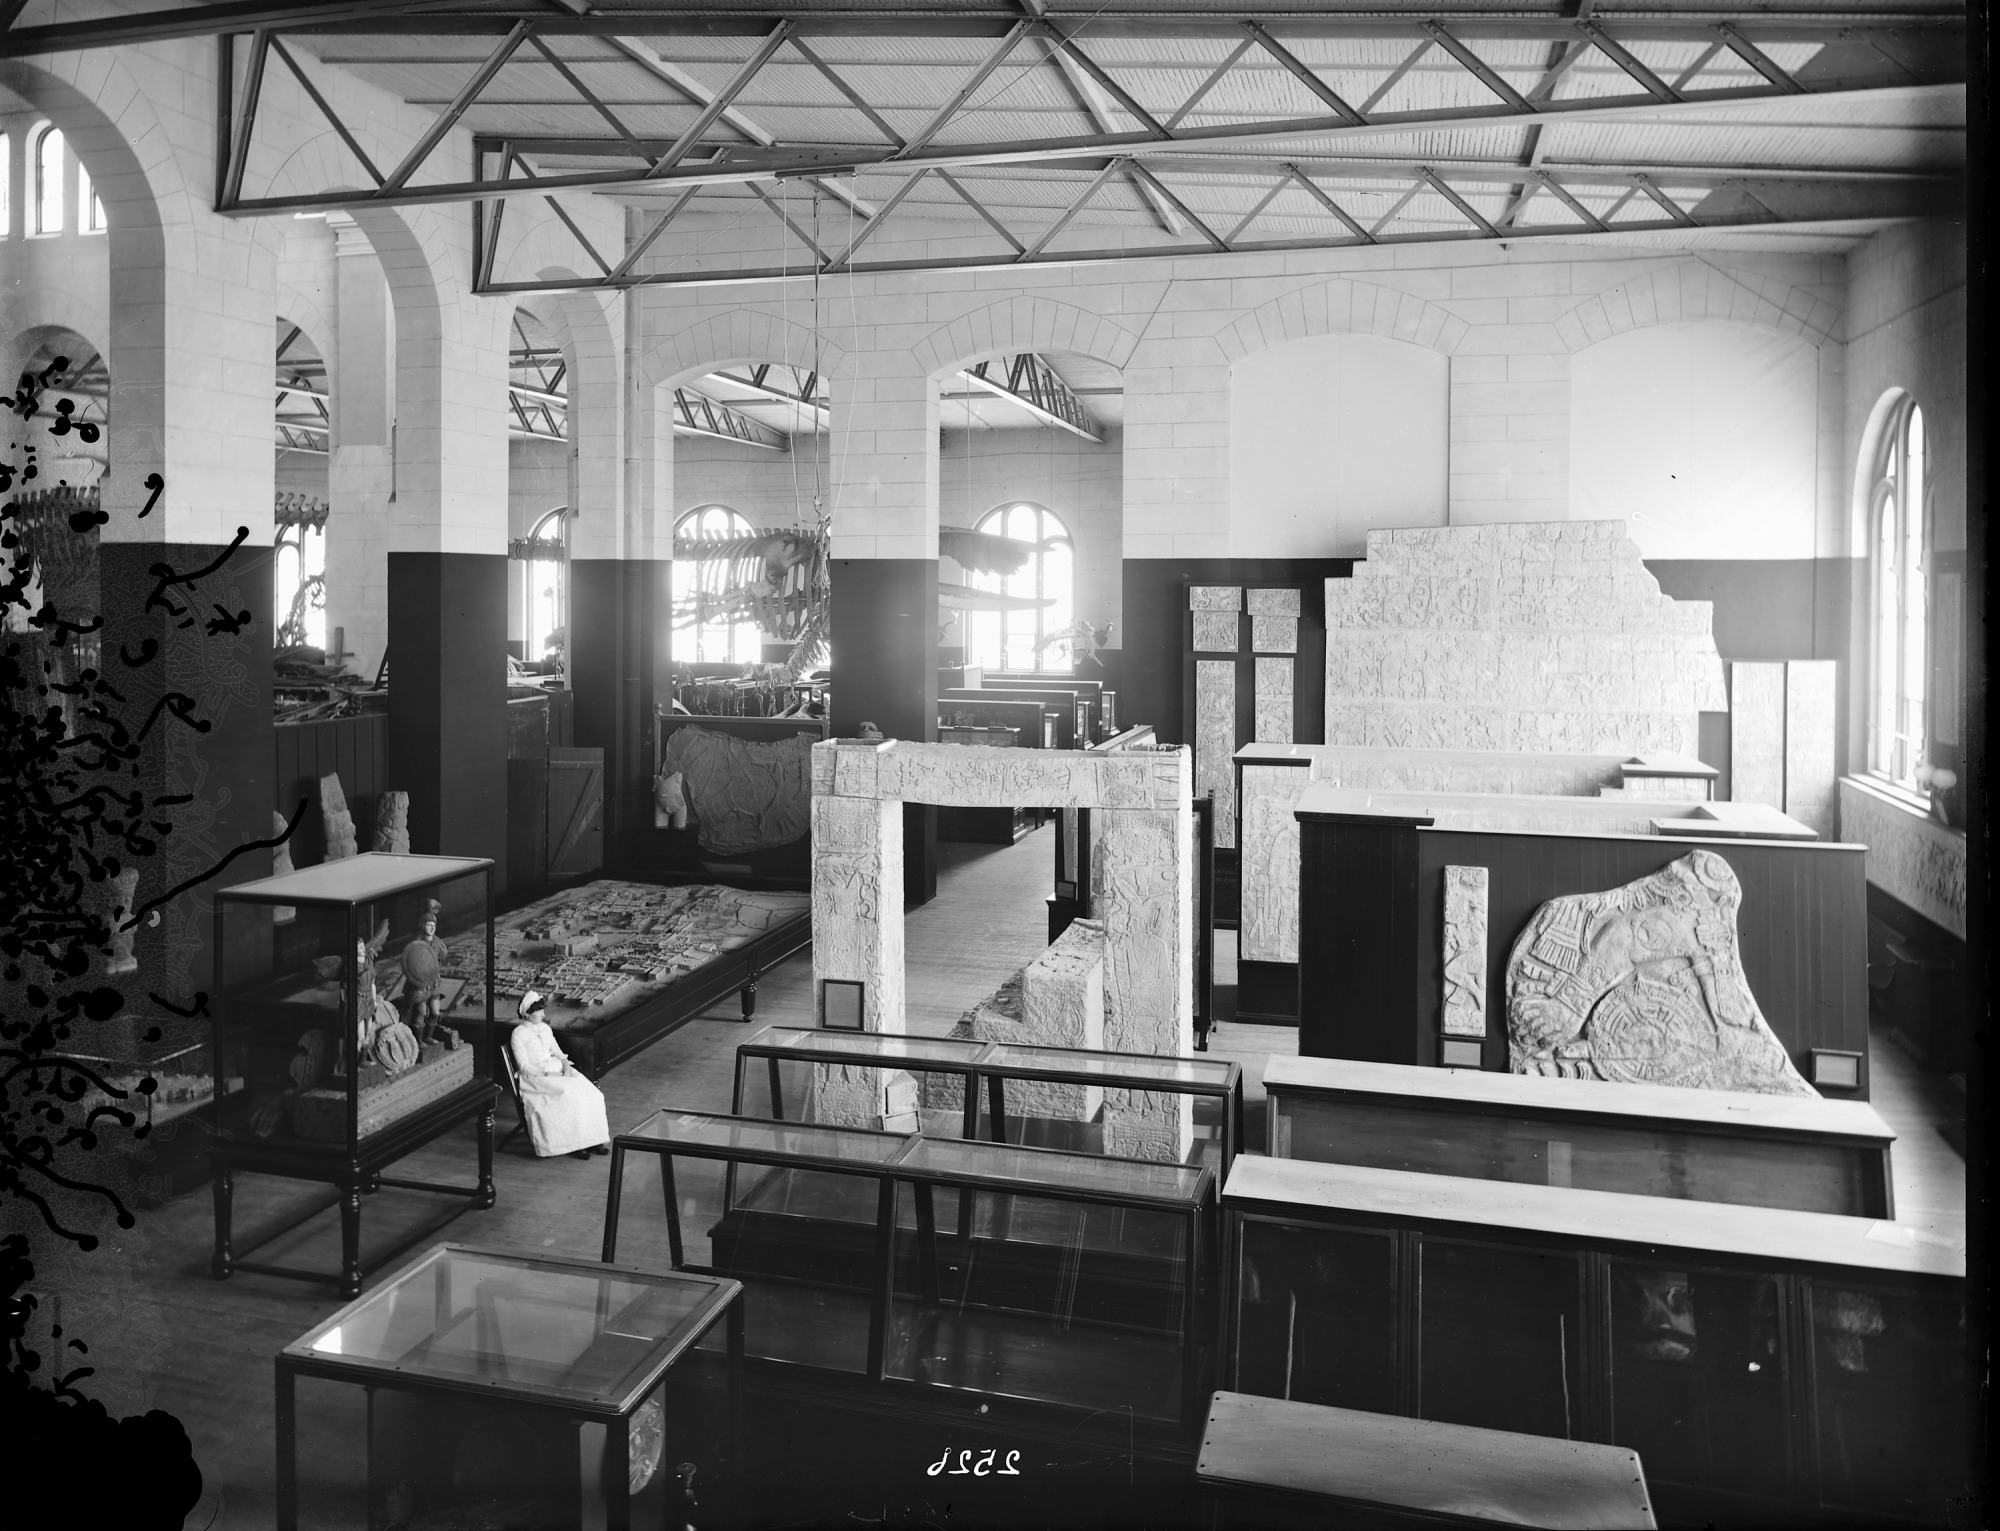 Prehistoric Archeology Exhibit, Arts and Industries Building